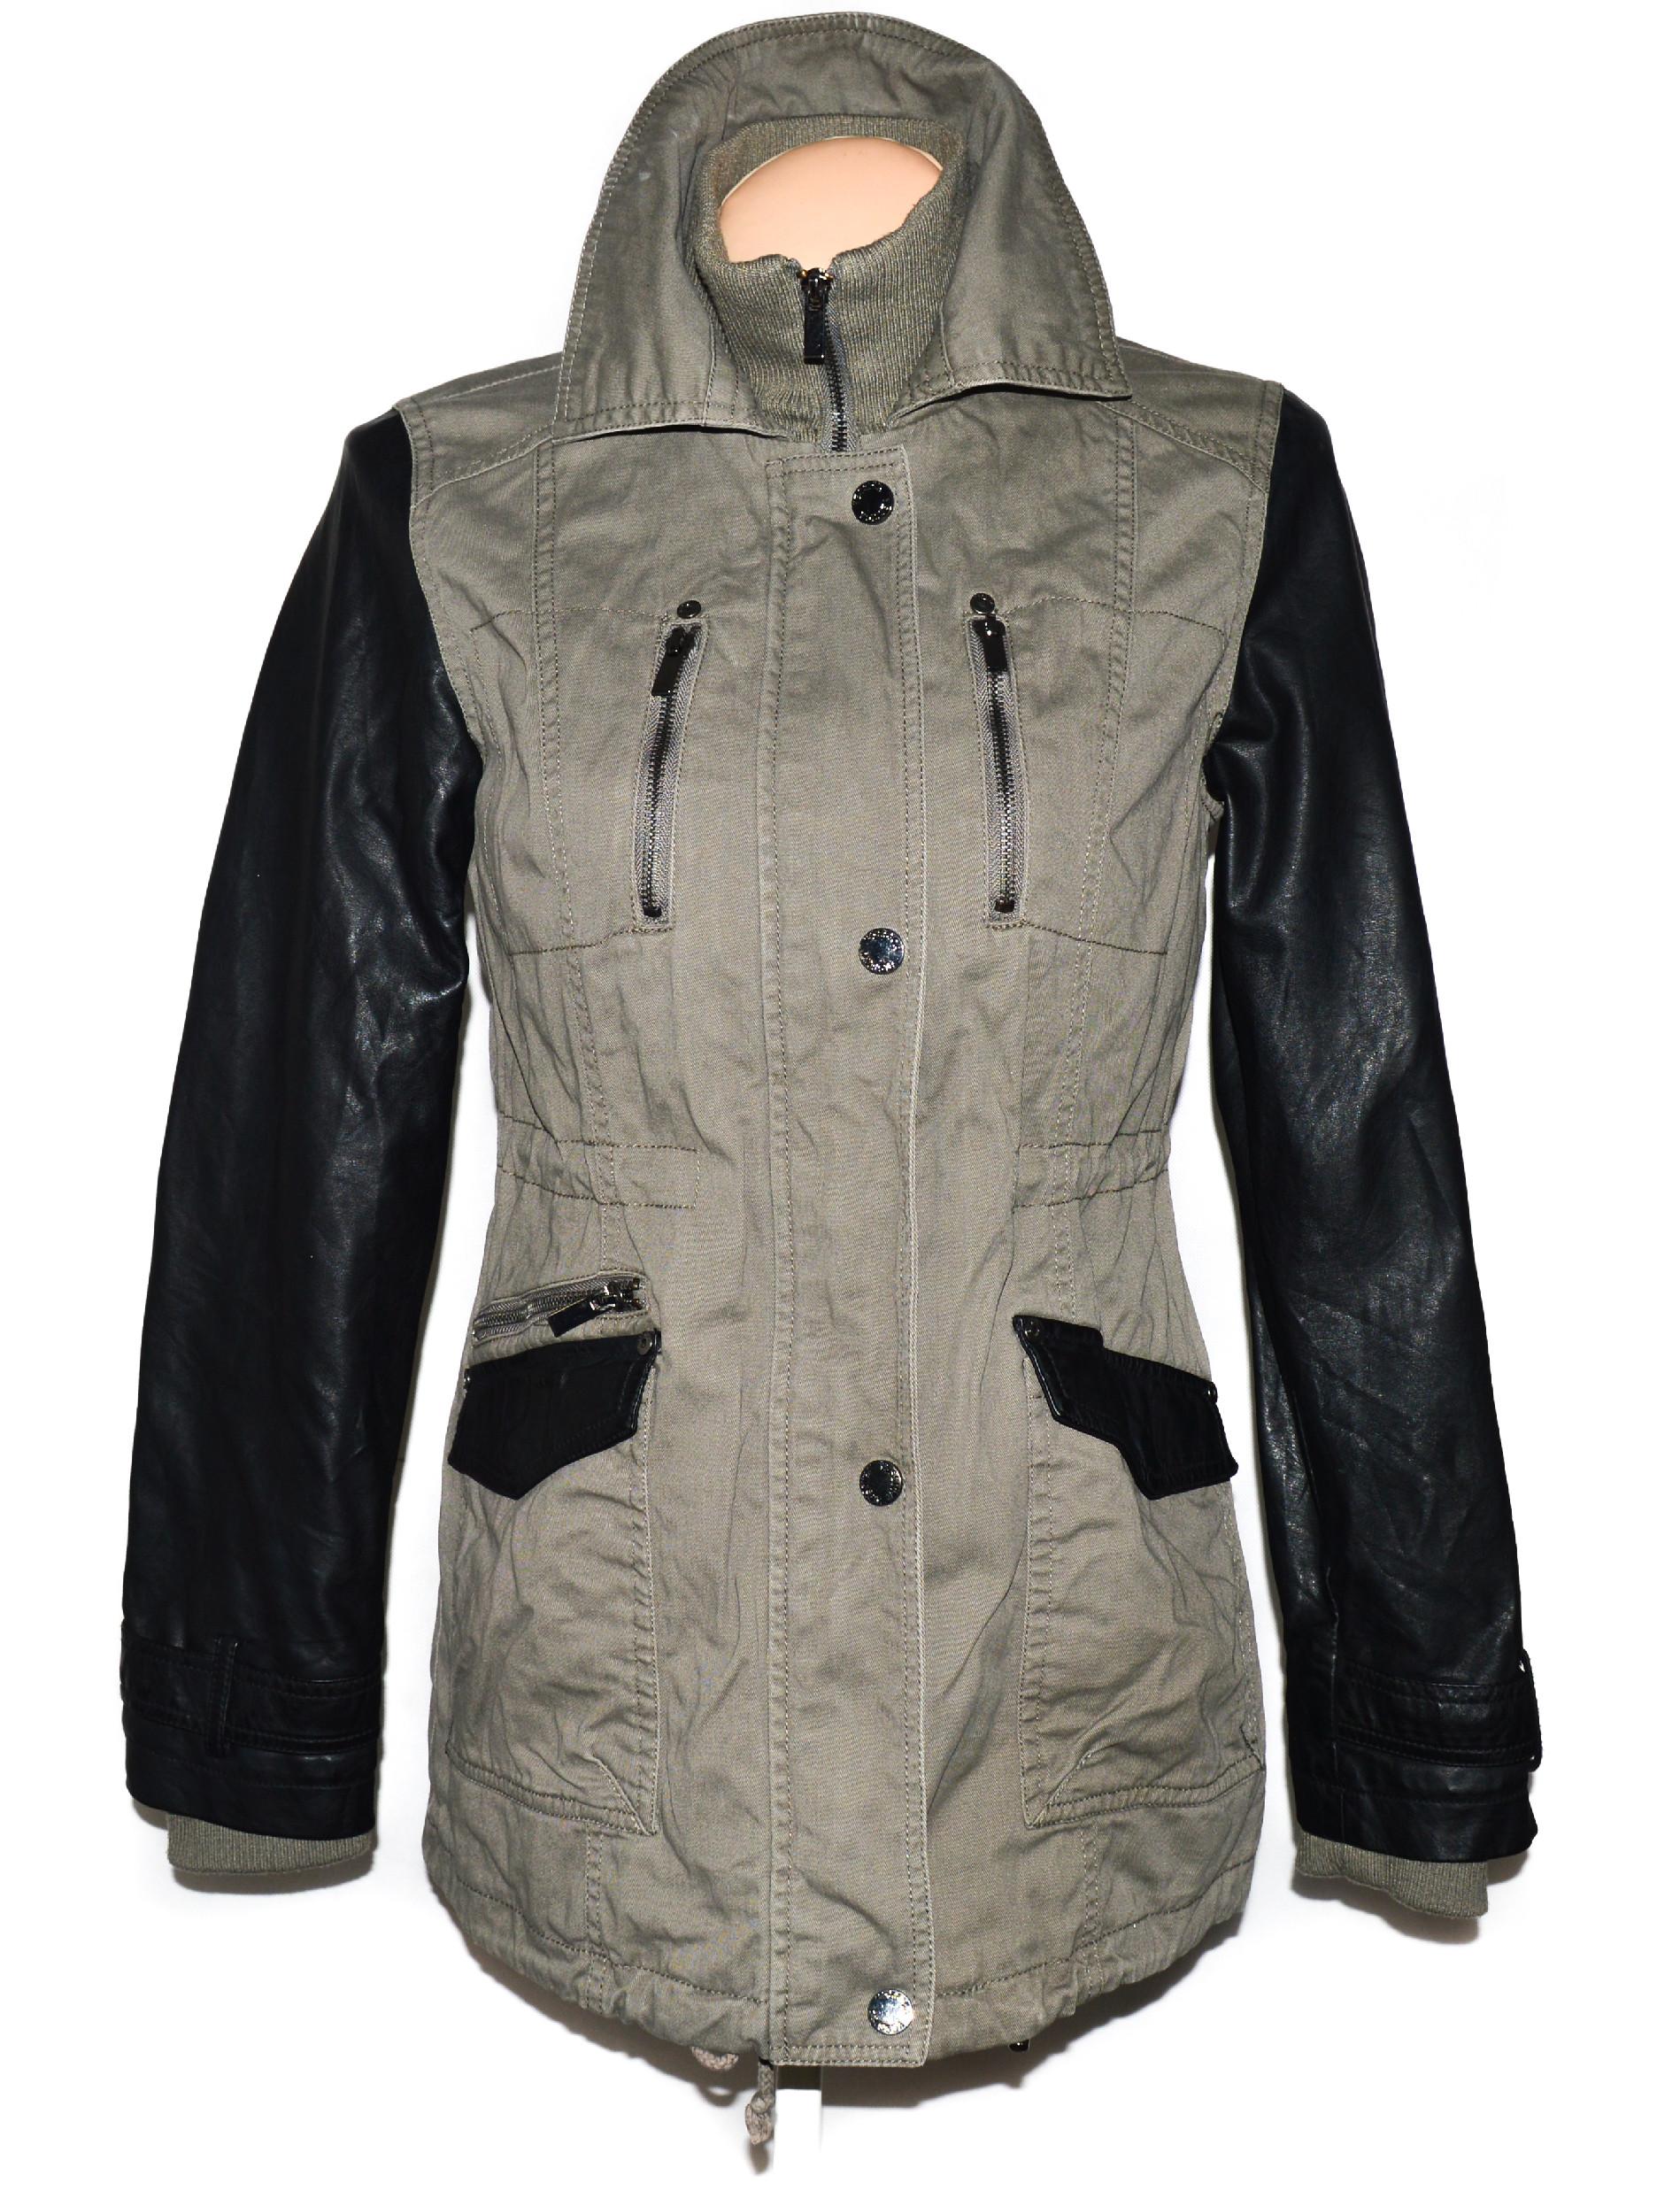 Dámský khaki kabátek s koženkovými rukávy C&A 12/38